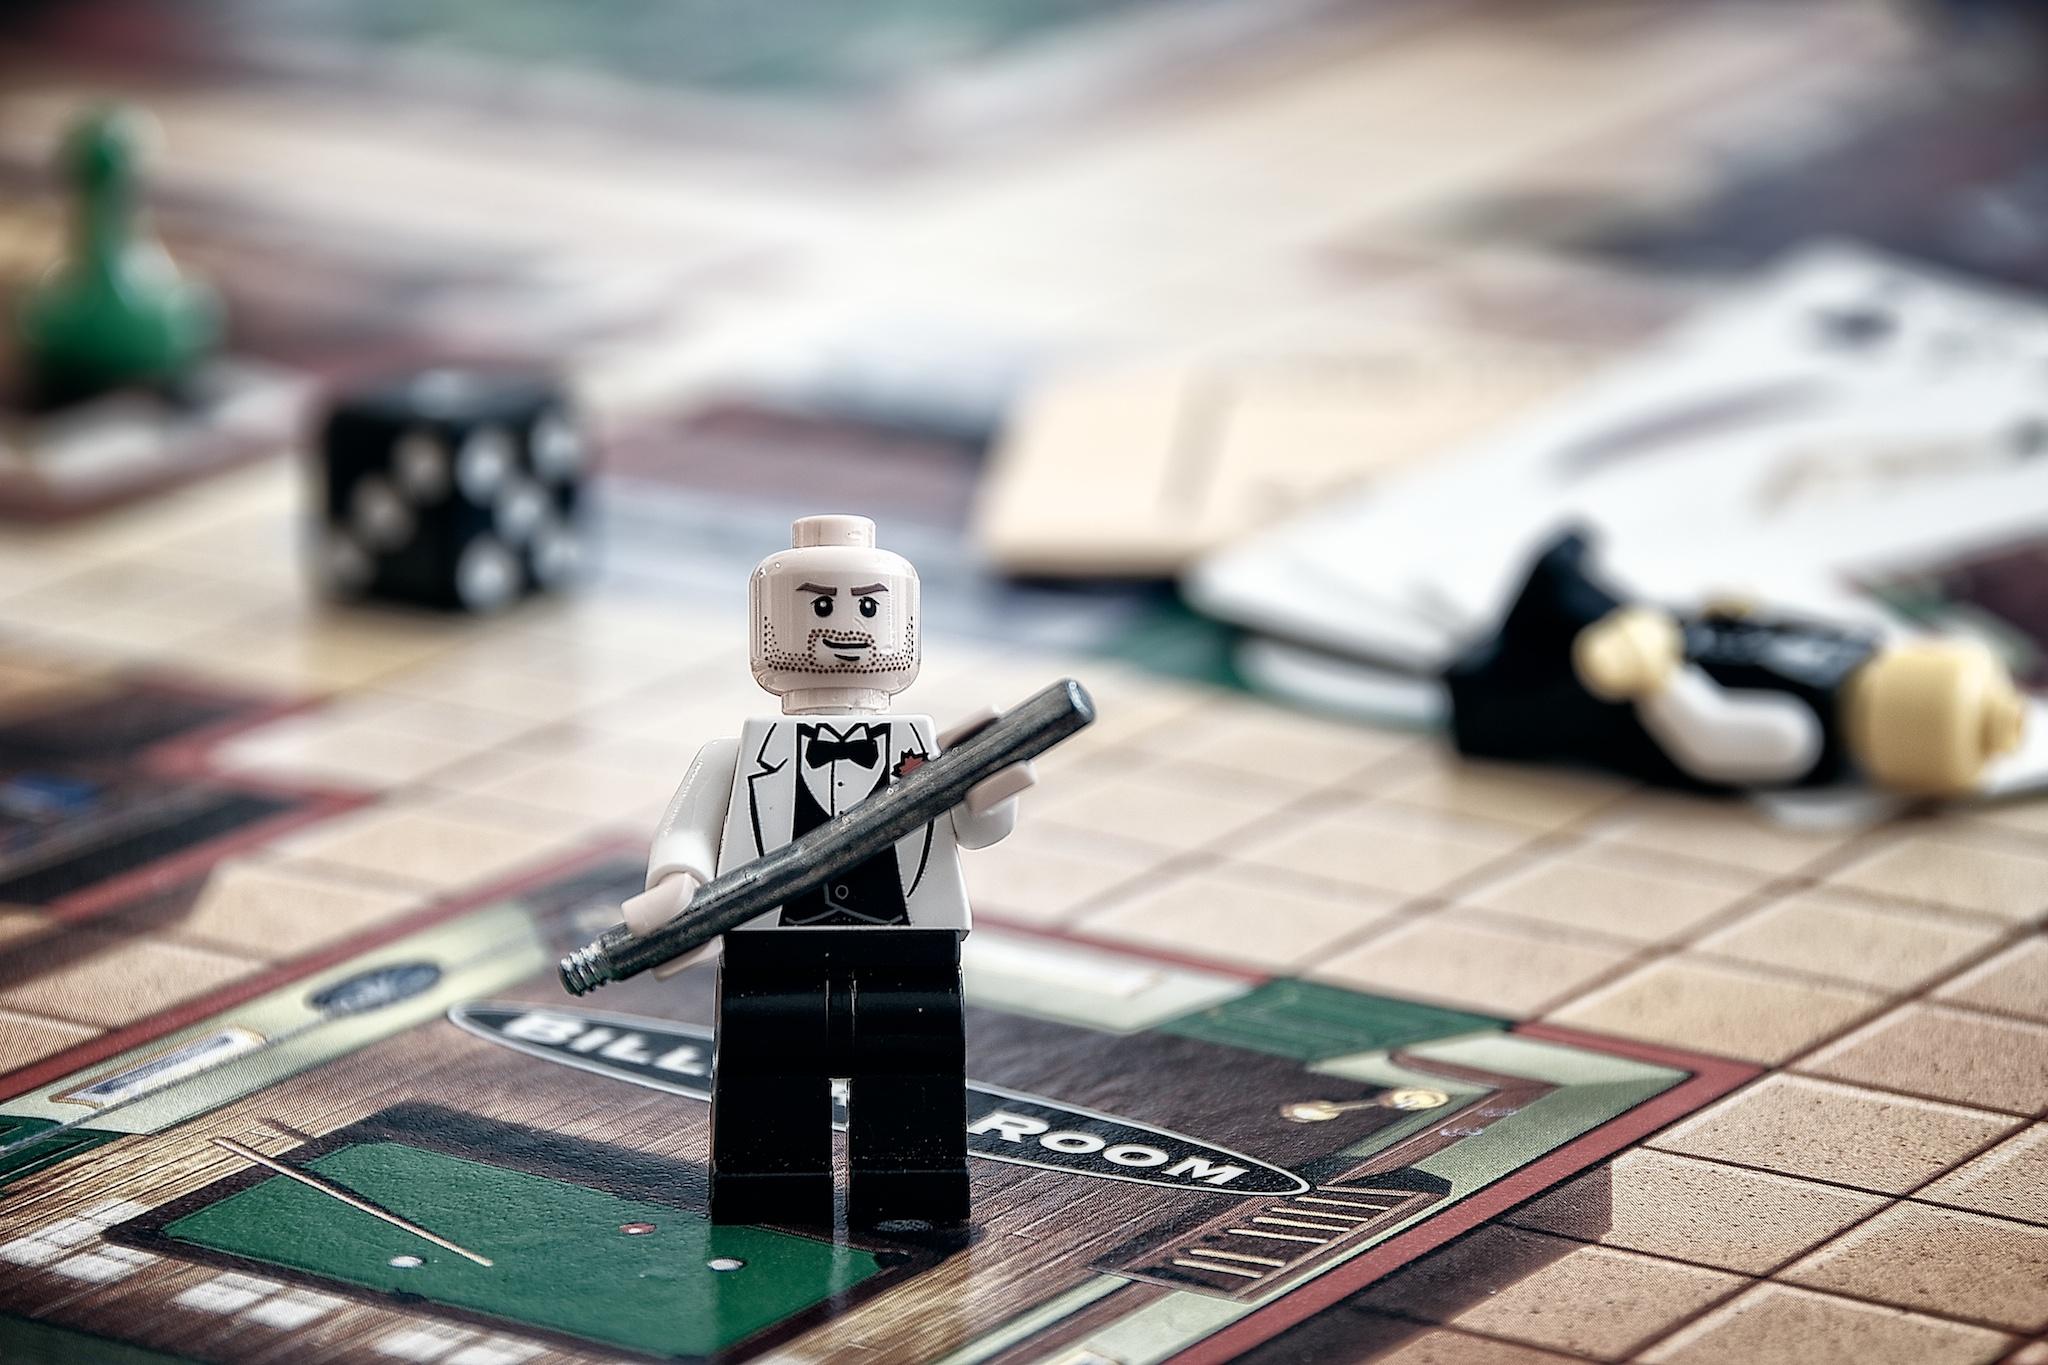 The Lego Murder Mystery